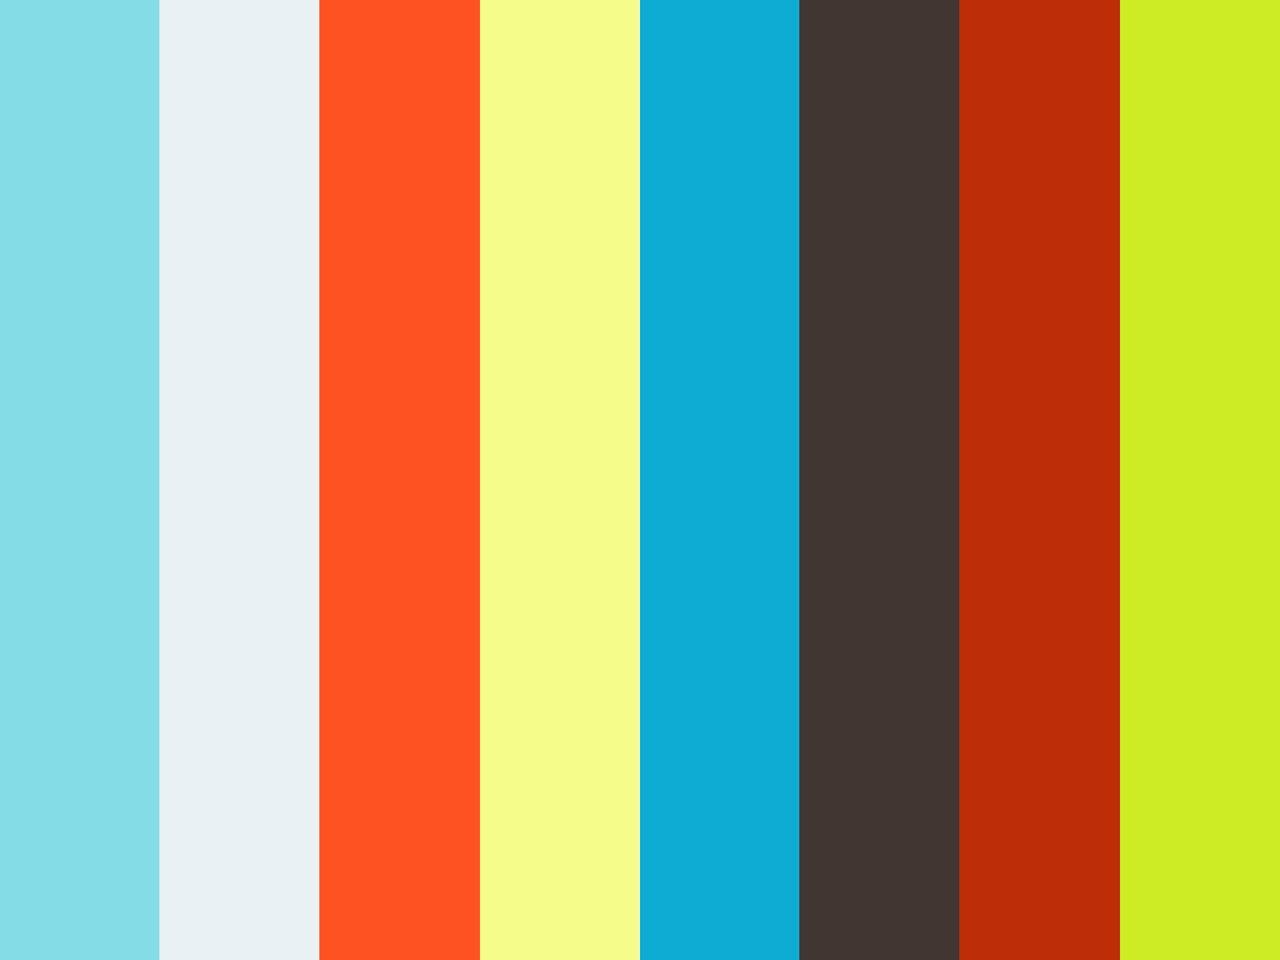 Fantastic 1 2 3 Nu Opgaver Kapitel Resume Small 1 Week Calendar Template Flat 10 Steps Writing Resume 10x10 Grid Template Old 185 Powerful Resume Verbs Brown2 Page Resume Template Download Hadoop Admin Training By Trainer Arun   Session 1 On Vimeo